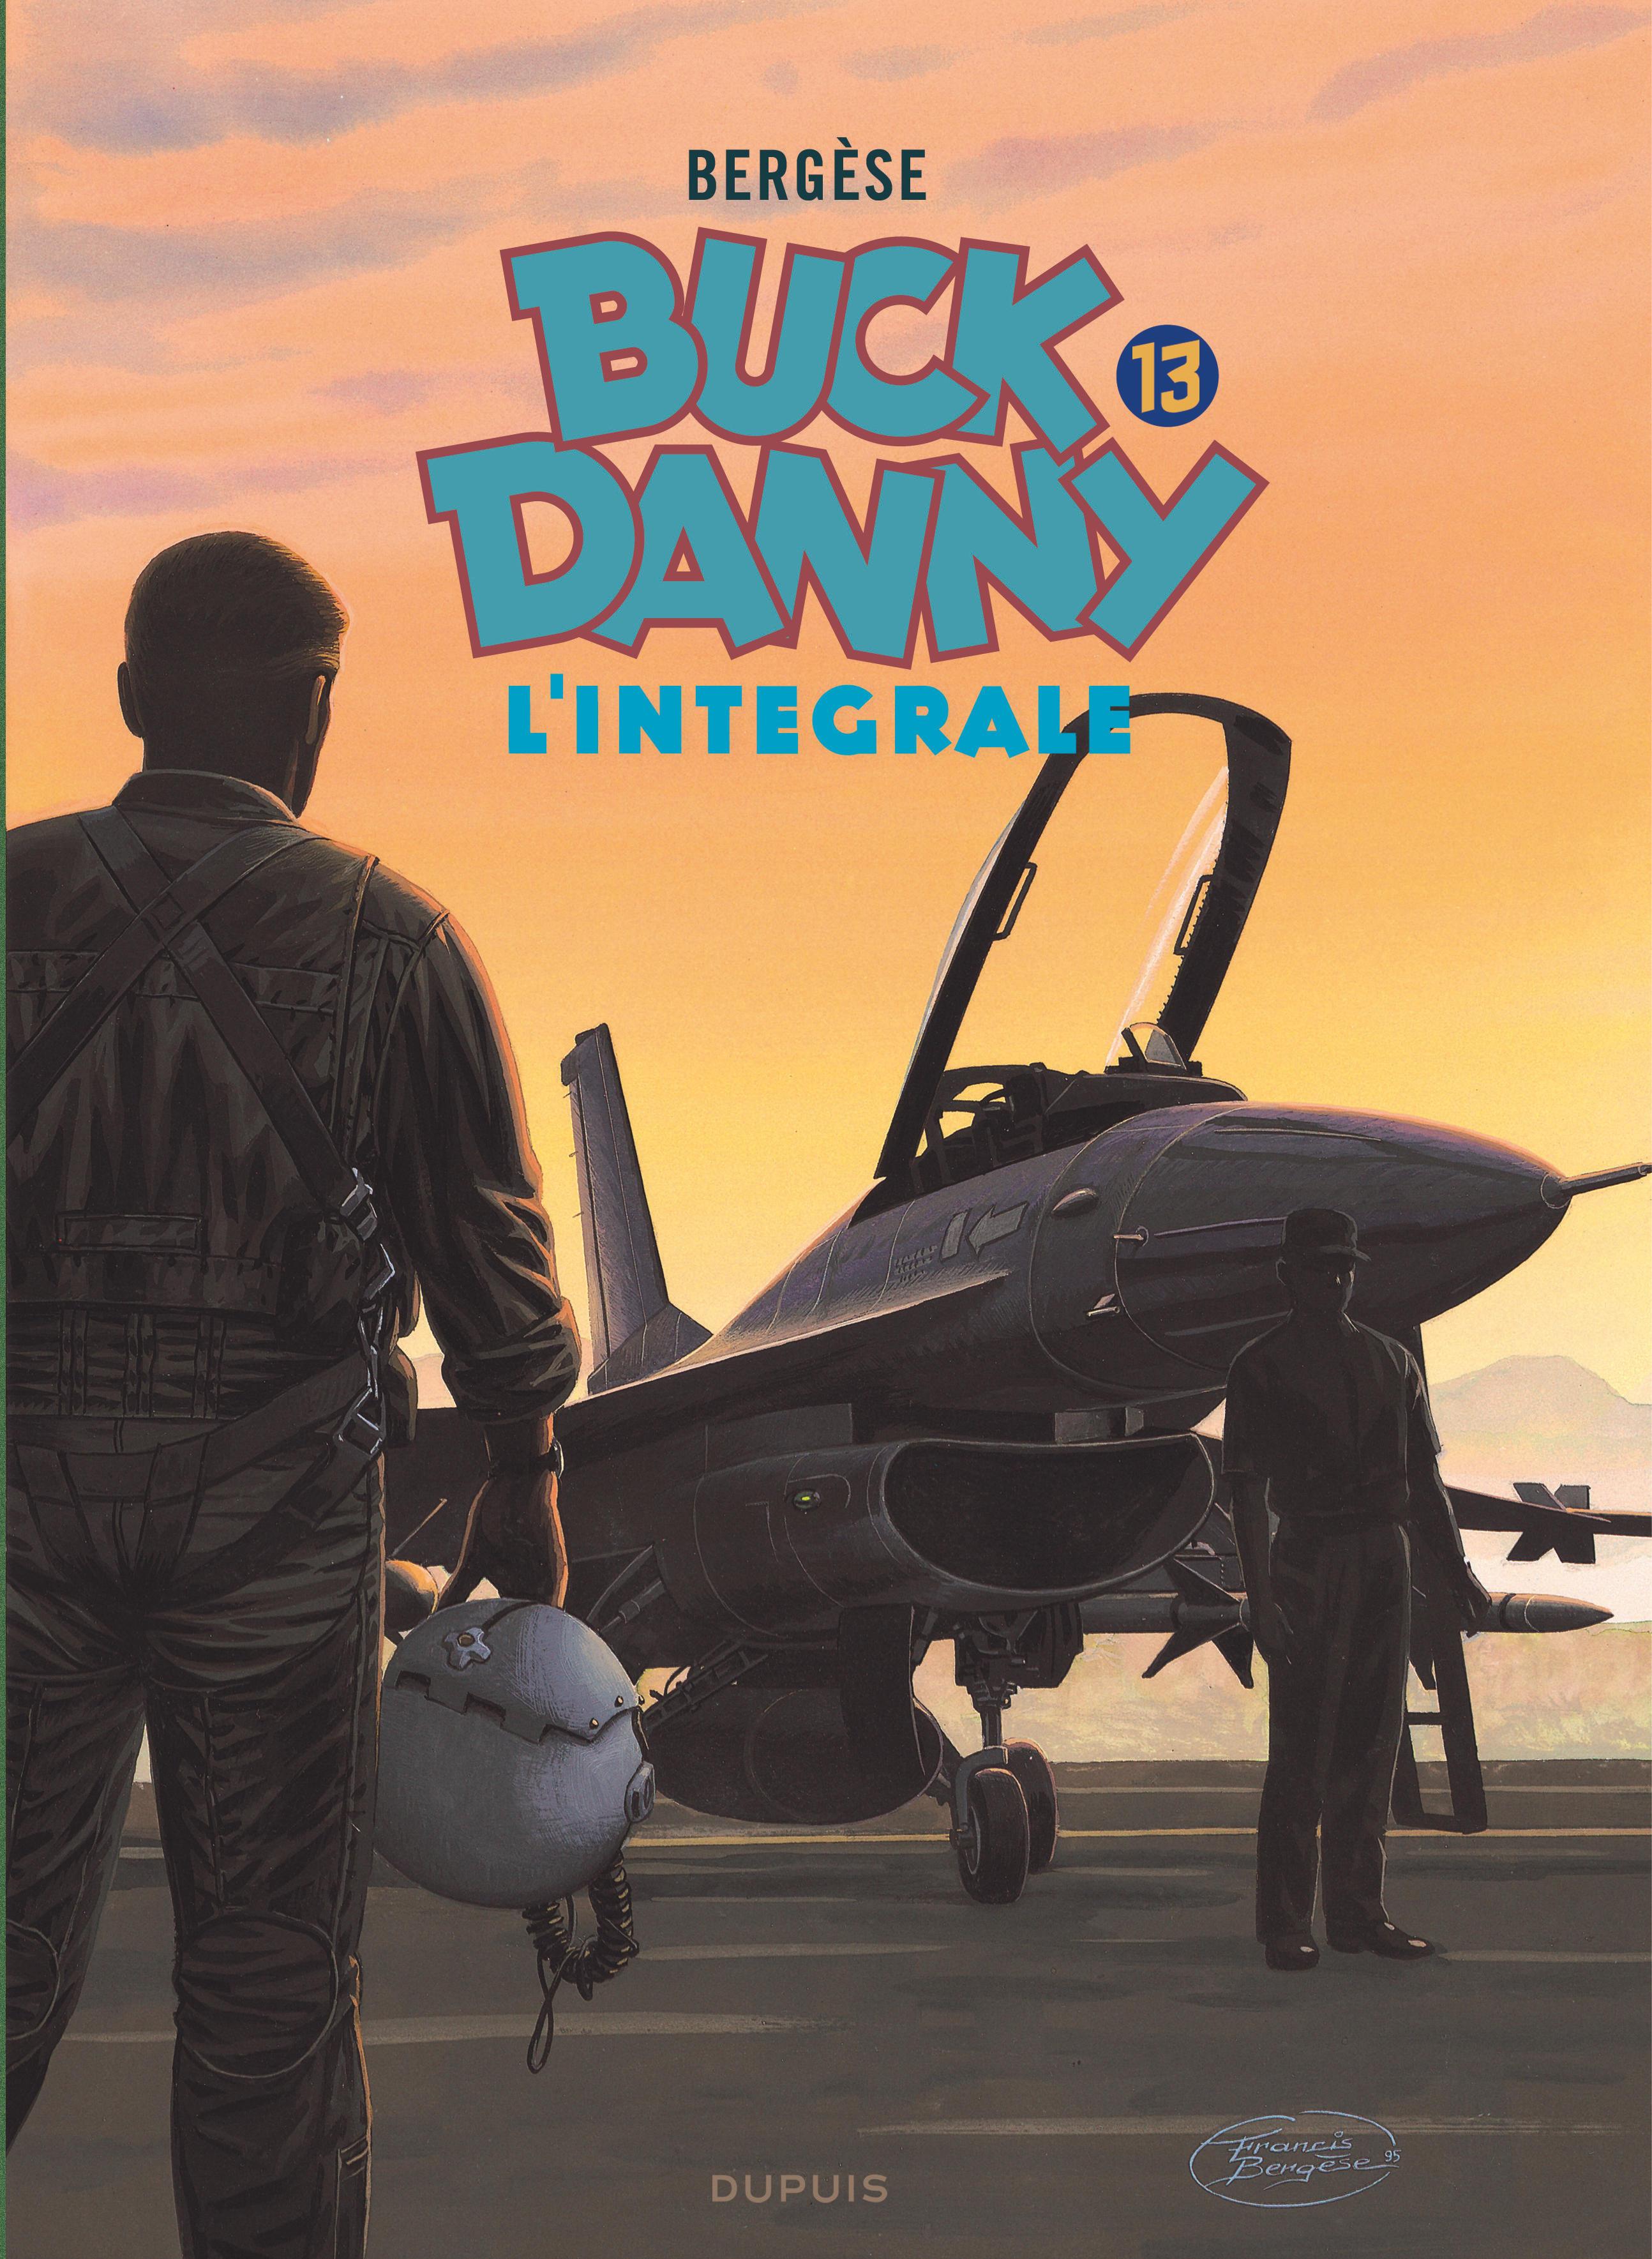 BUCK DANNY (INTEGRALE) - BUCK DANNY - L'INTEGRALE - TOME 13 - BUCK DANNY 13 (INTEGRALE) 1993 - 1999